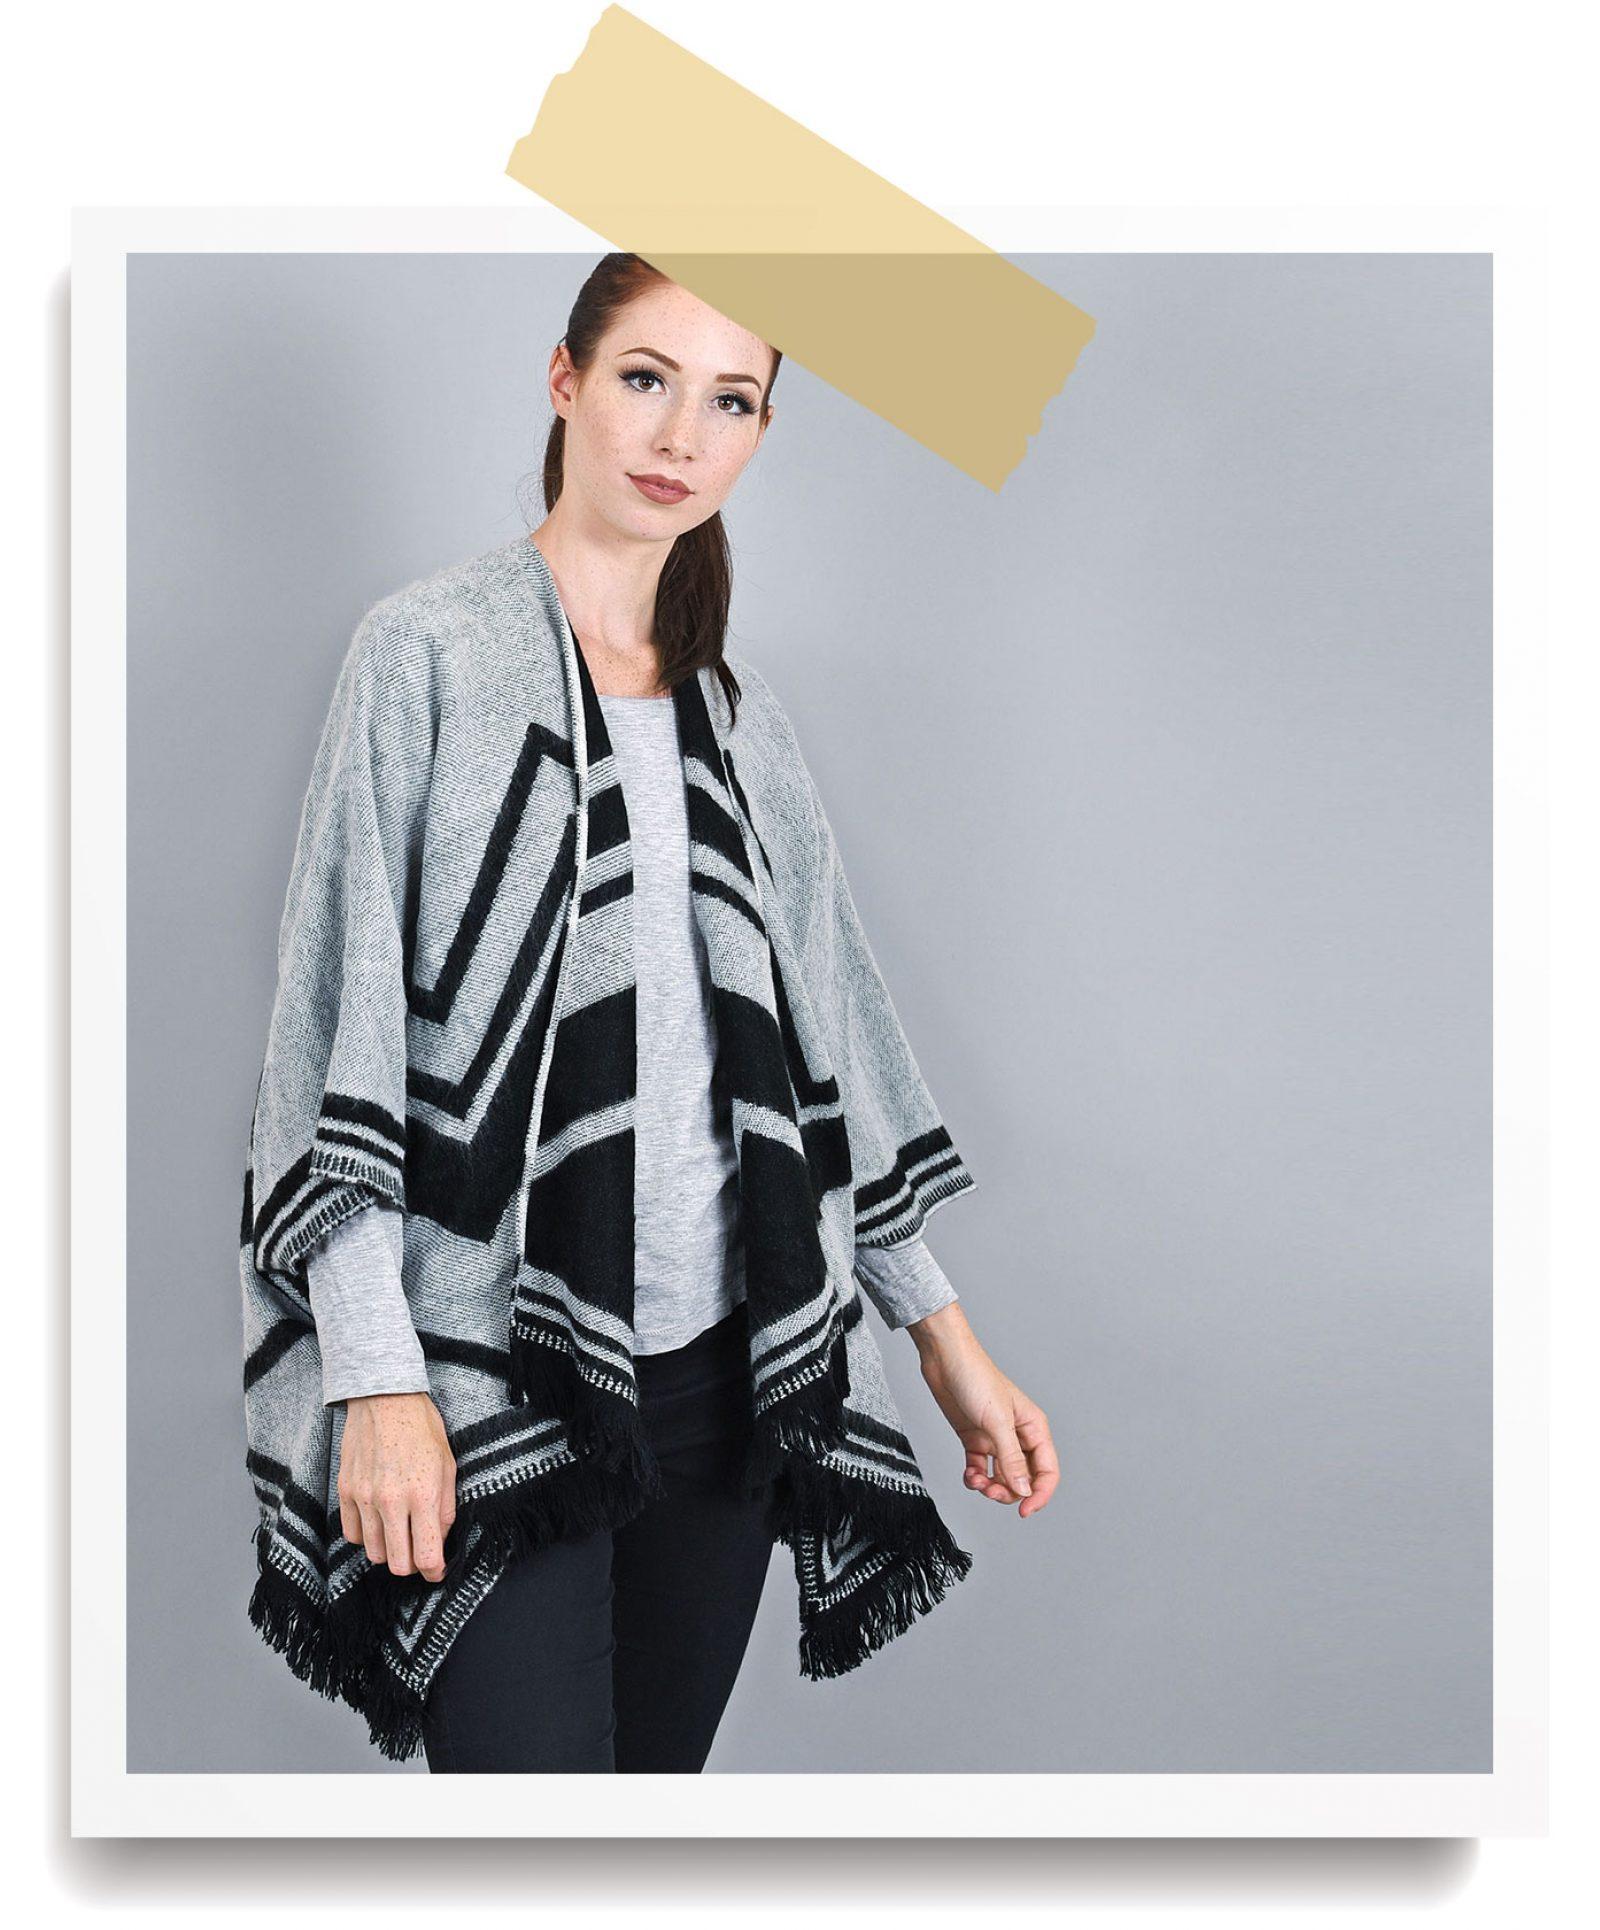 http://lookbook.allee-du-foulard.fr/wp-content/uploads/2018/06/0680-ADF-Accessoires-de-mode-LB-Soldes-Ete-poncho-chol-1600x1930.jpg